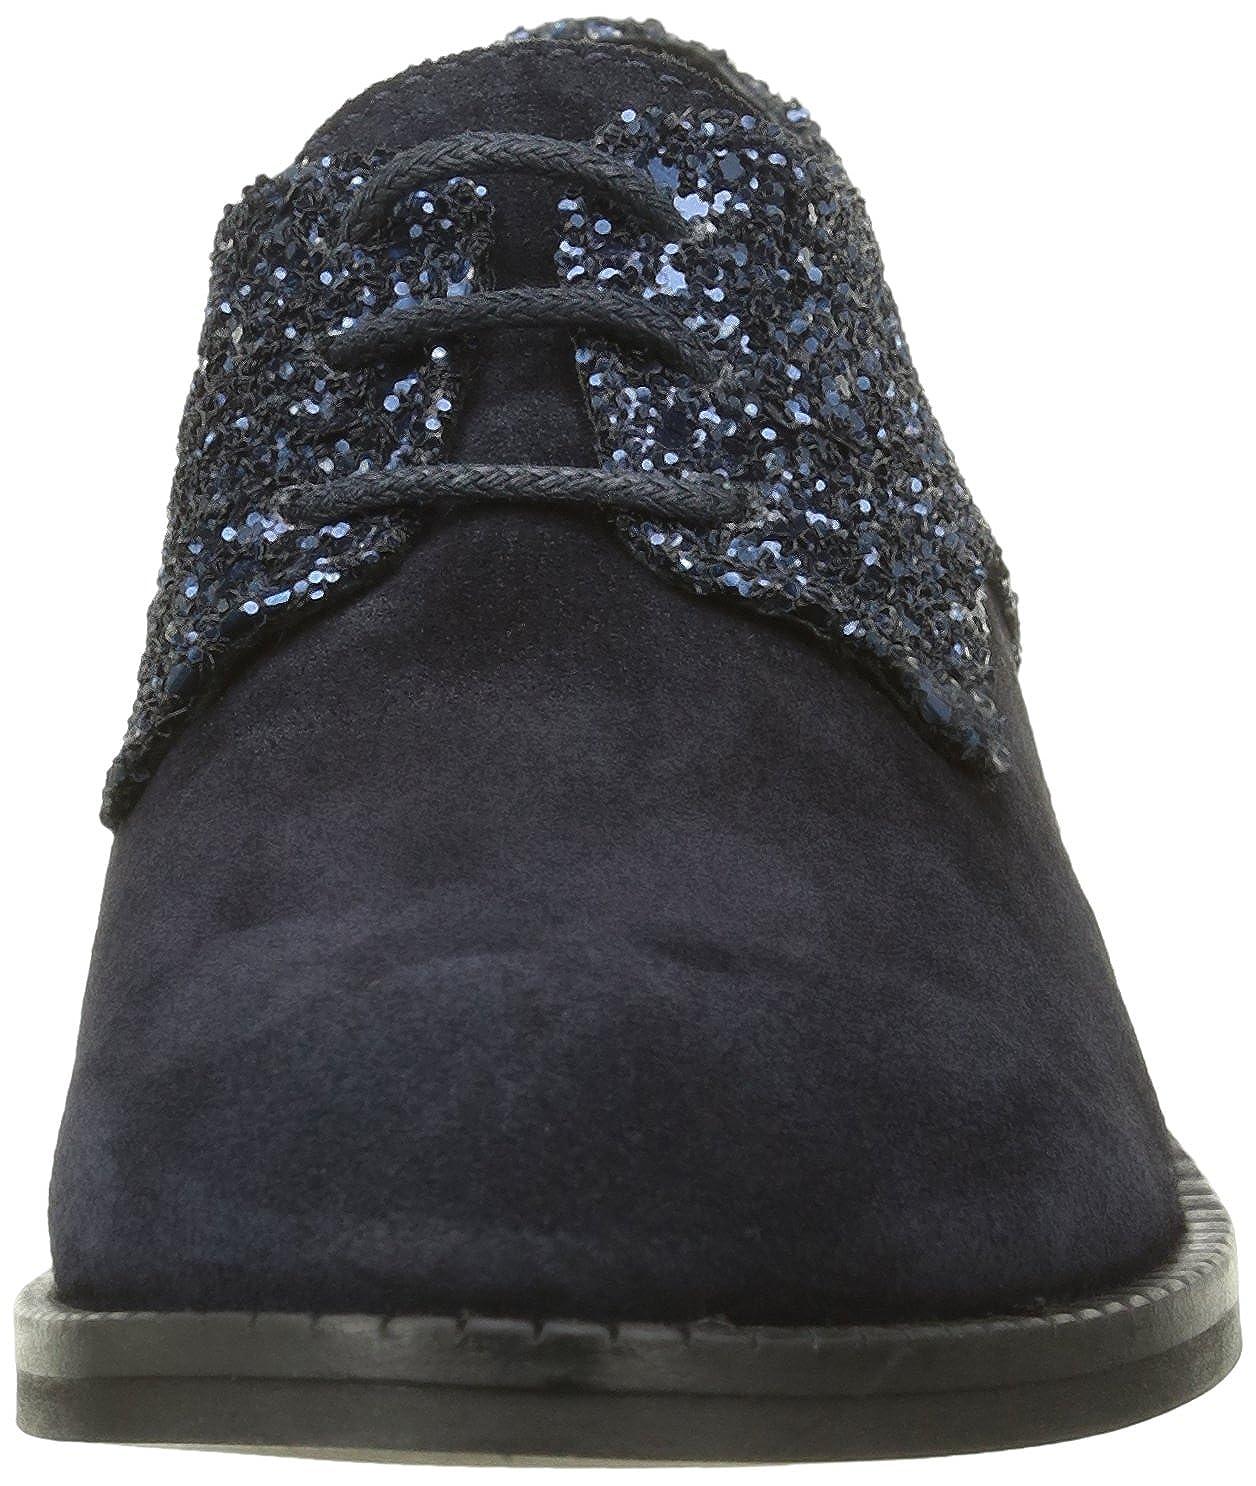 Cheville Chaussures lac/ées Fille Yep by Jonak Georgine